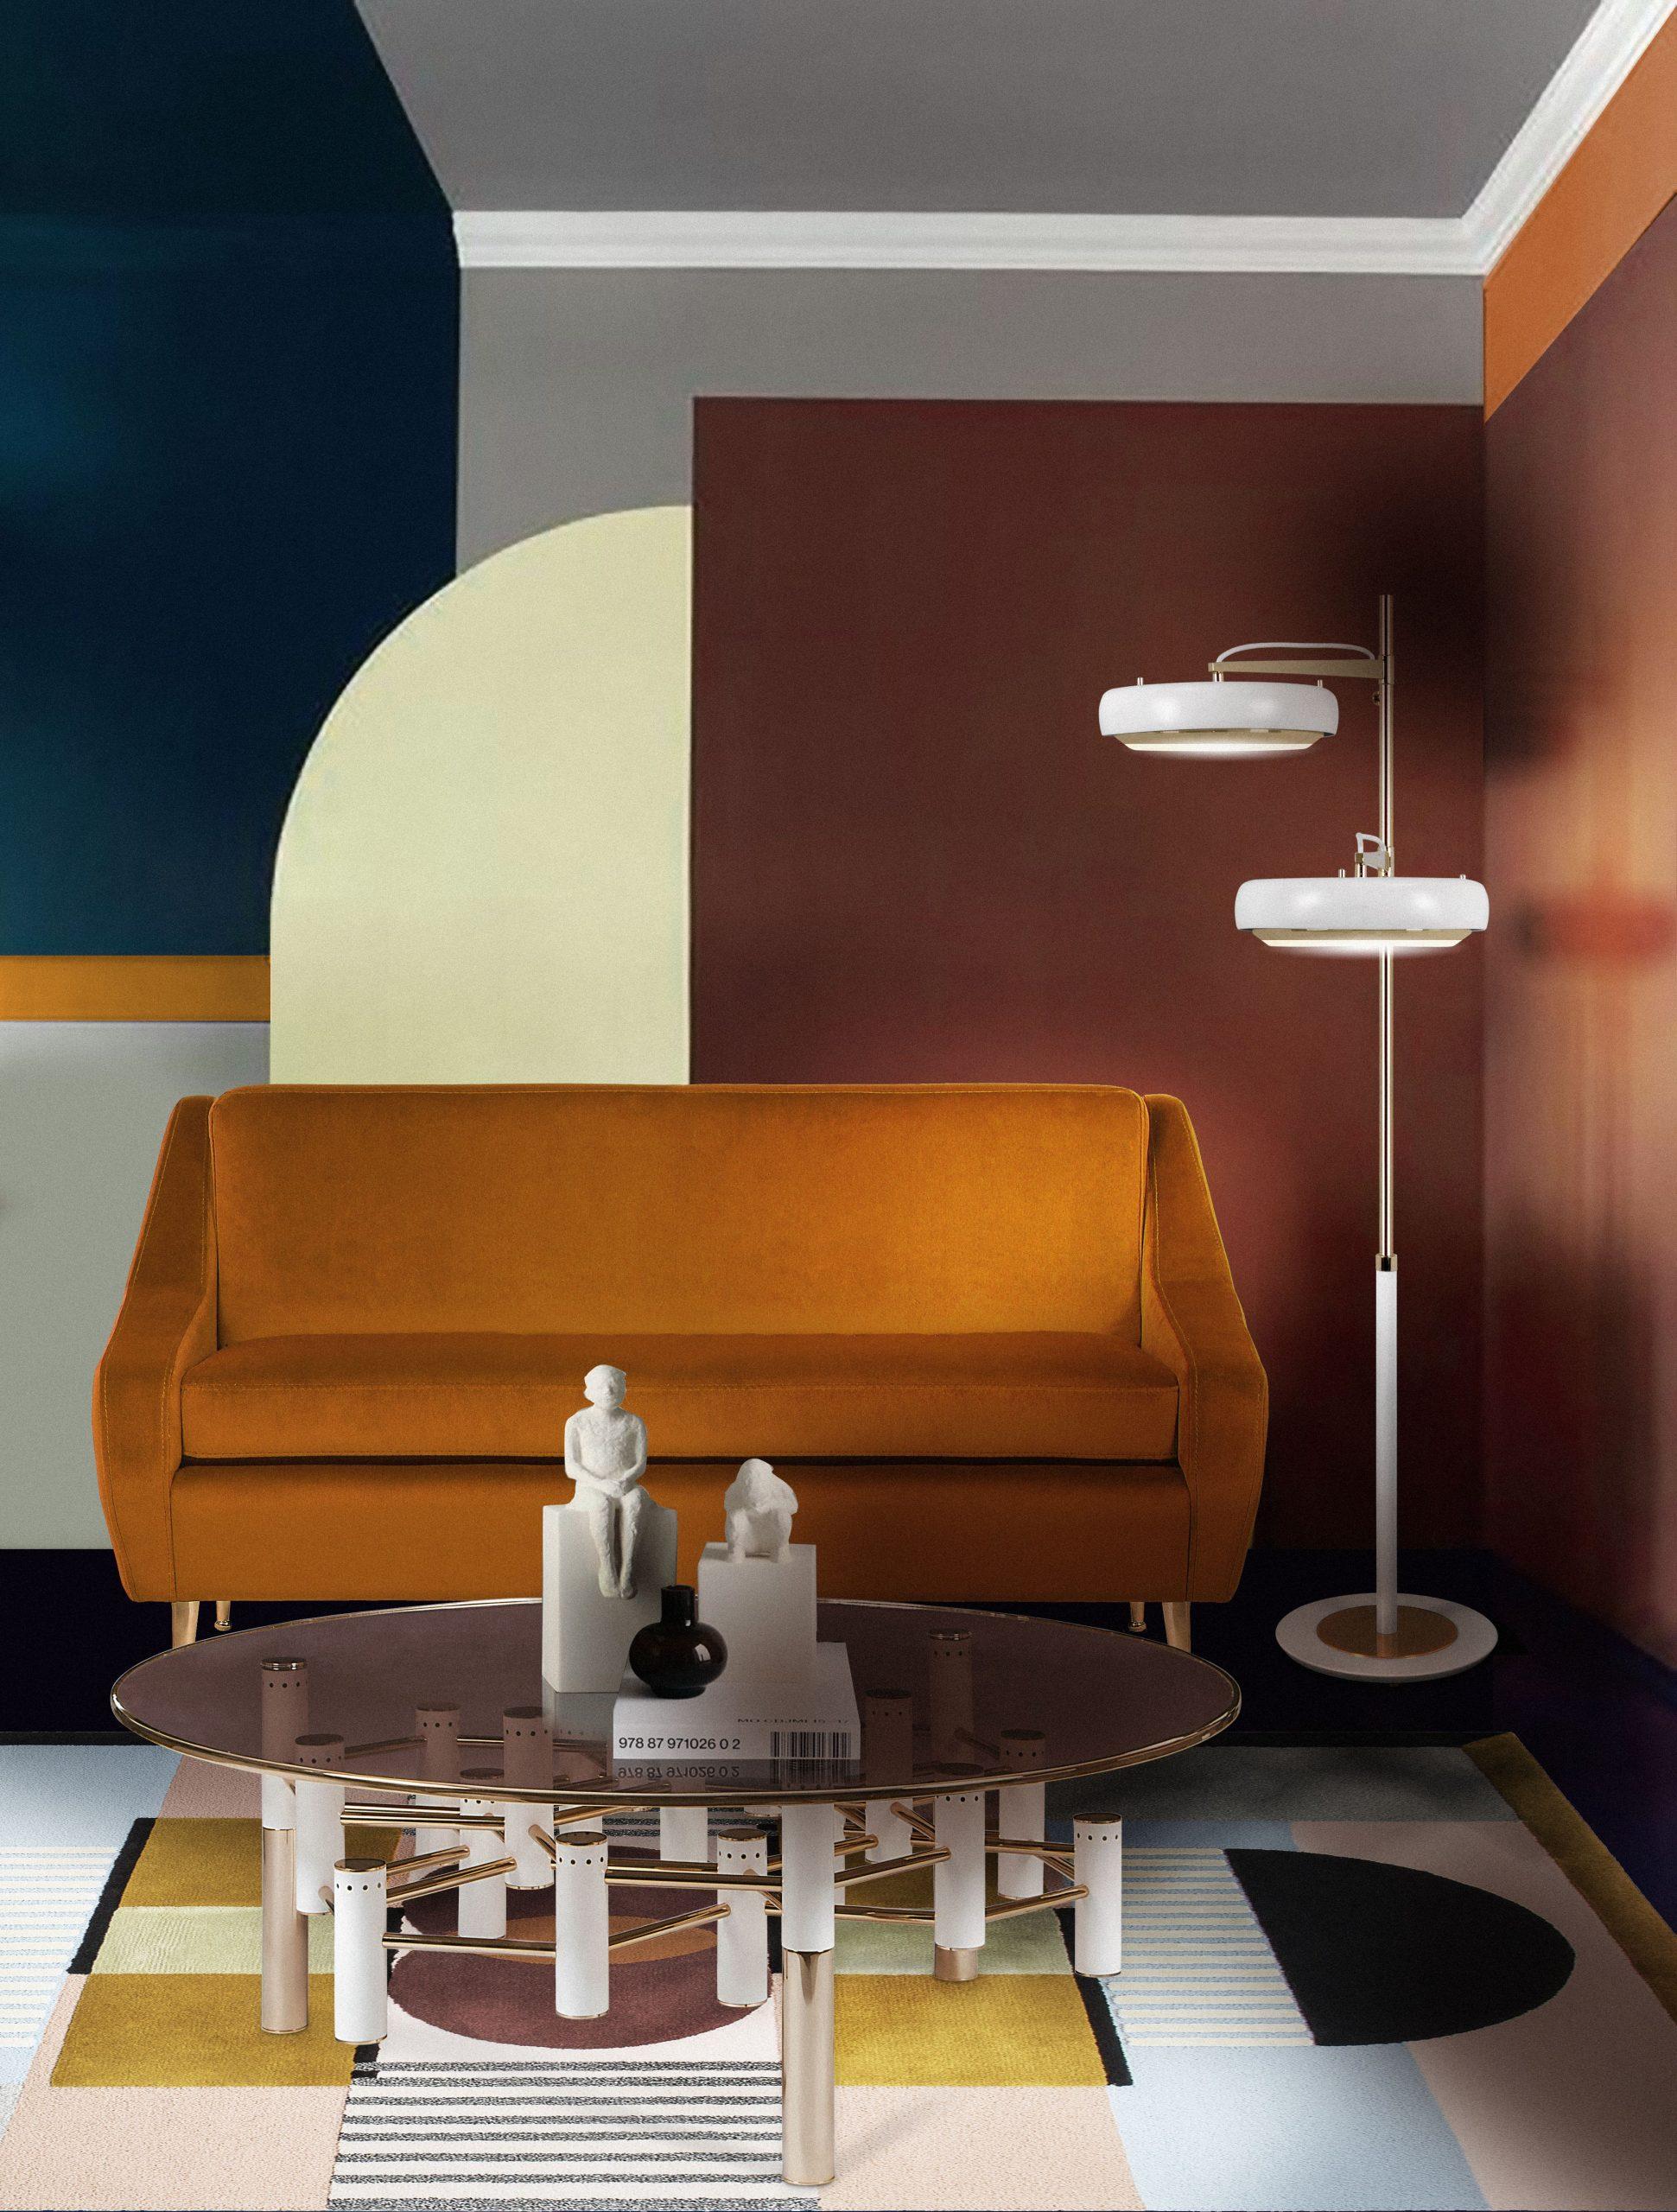 5 mid-century modern rug ideas - Living Room With Isaac Rug